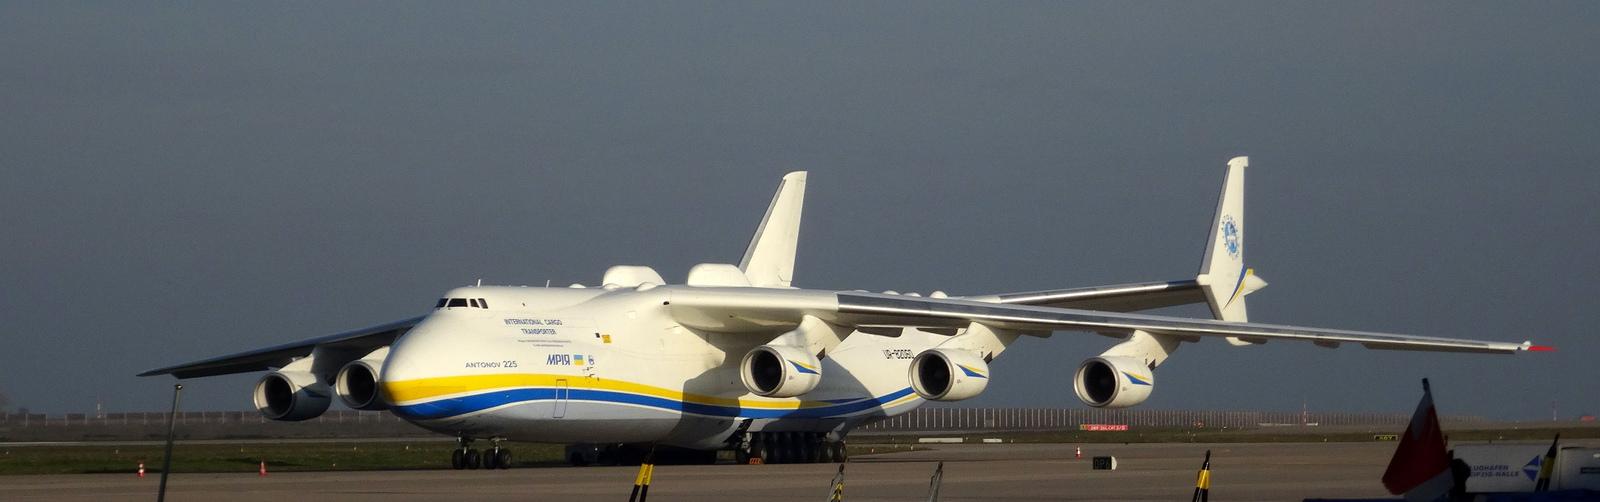 Antonov An-225 in Leipzig